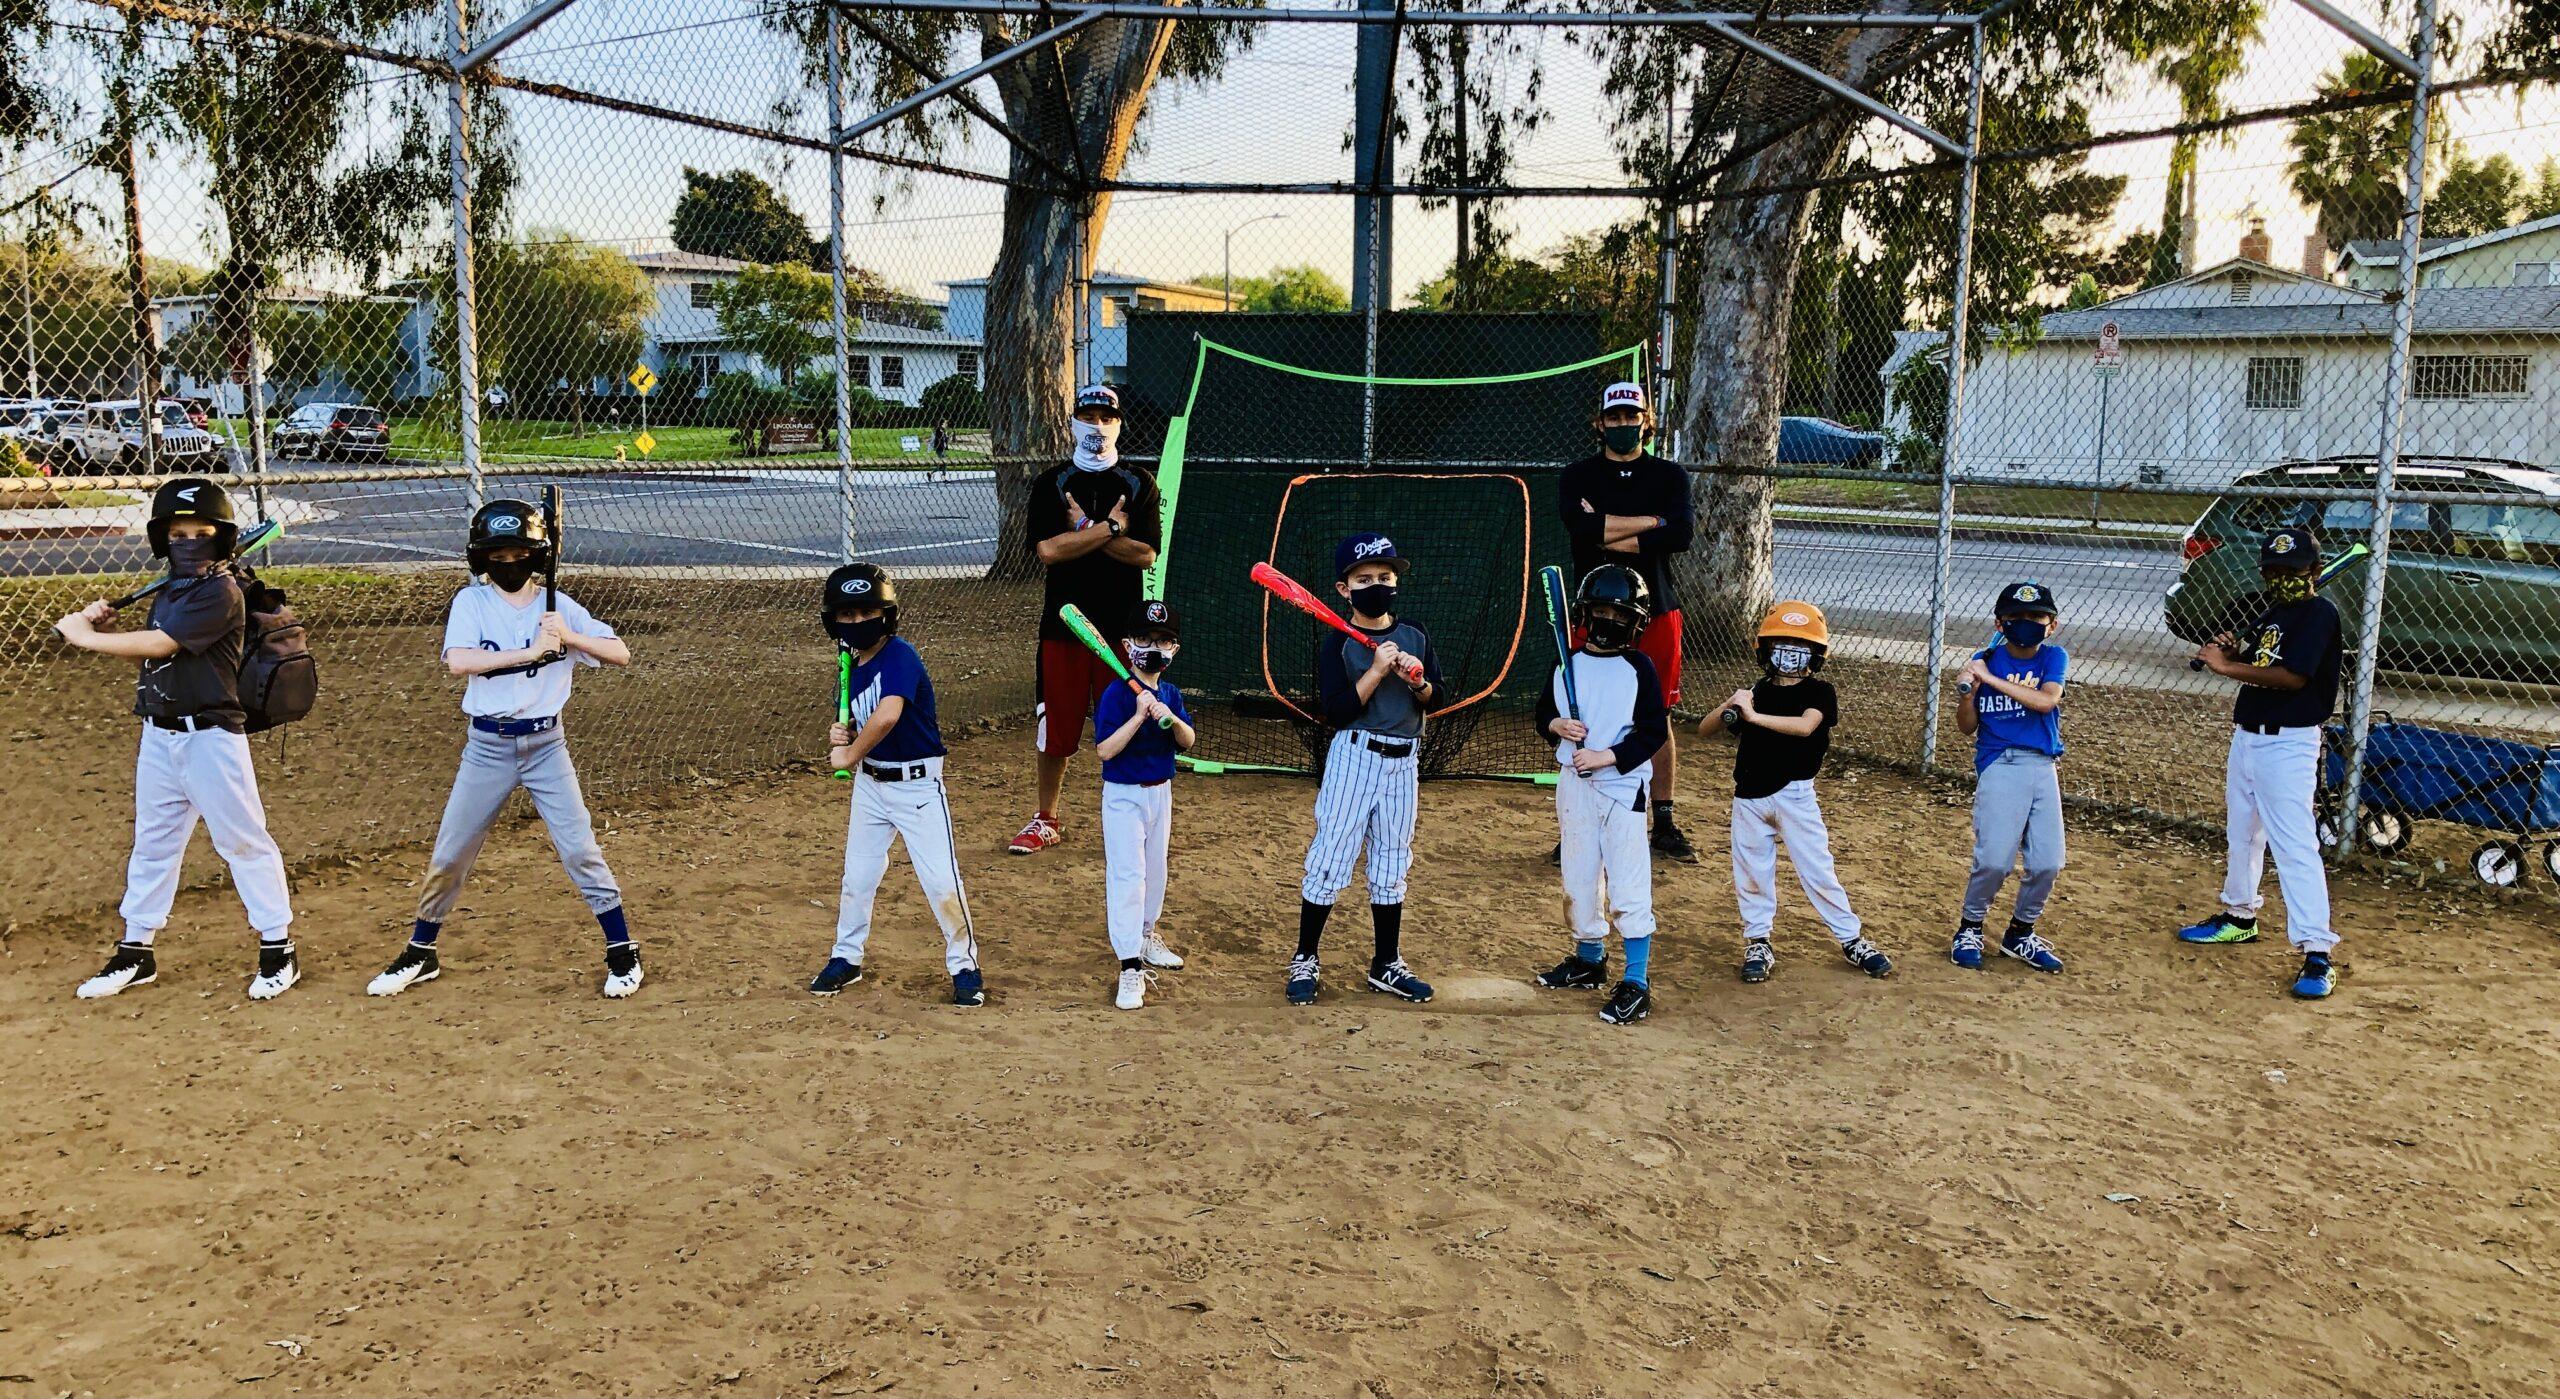 Hustle Ball in Santa Monica